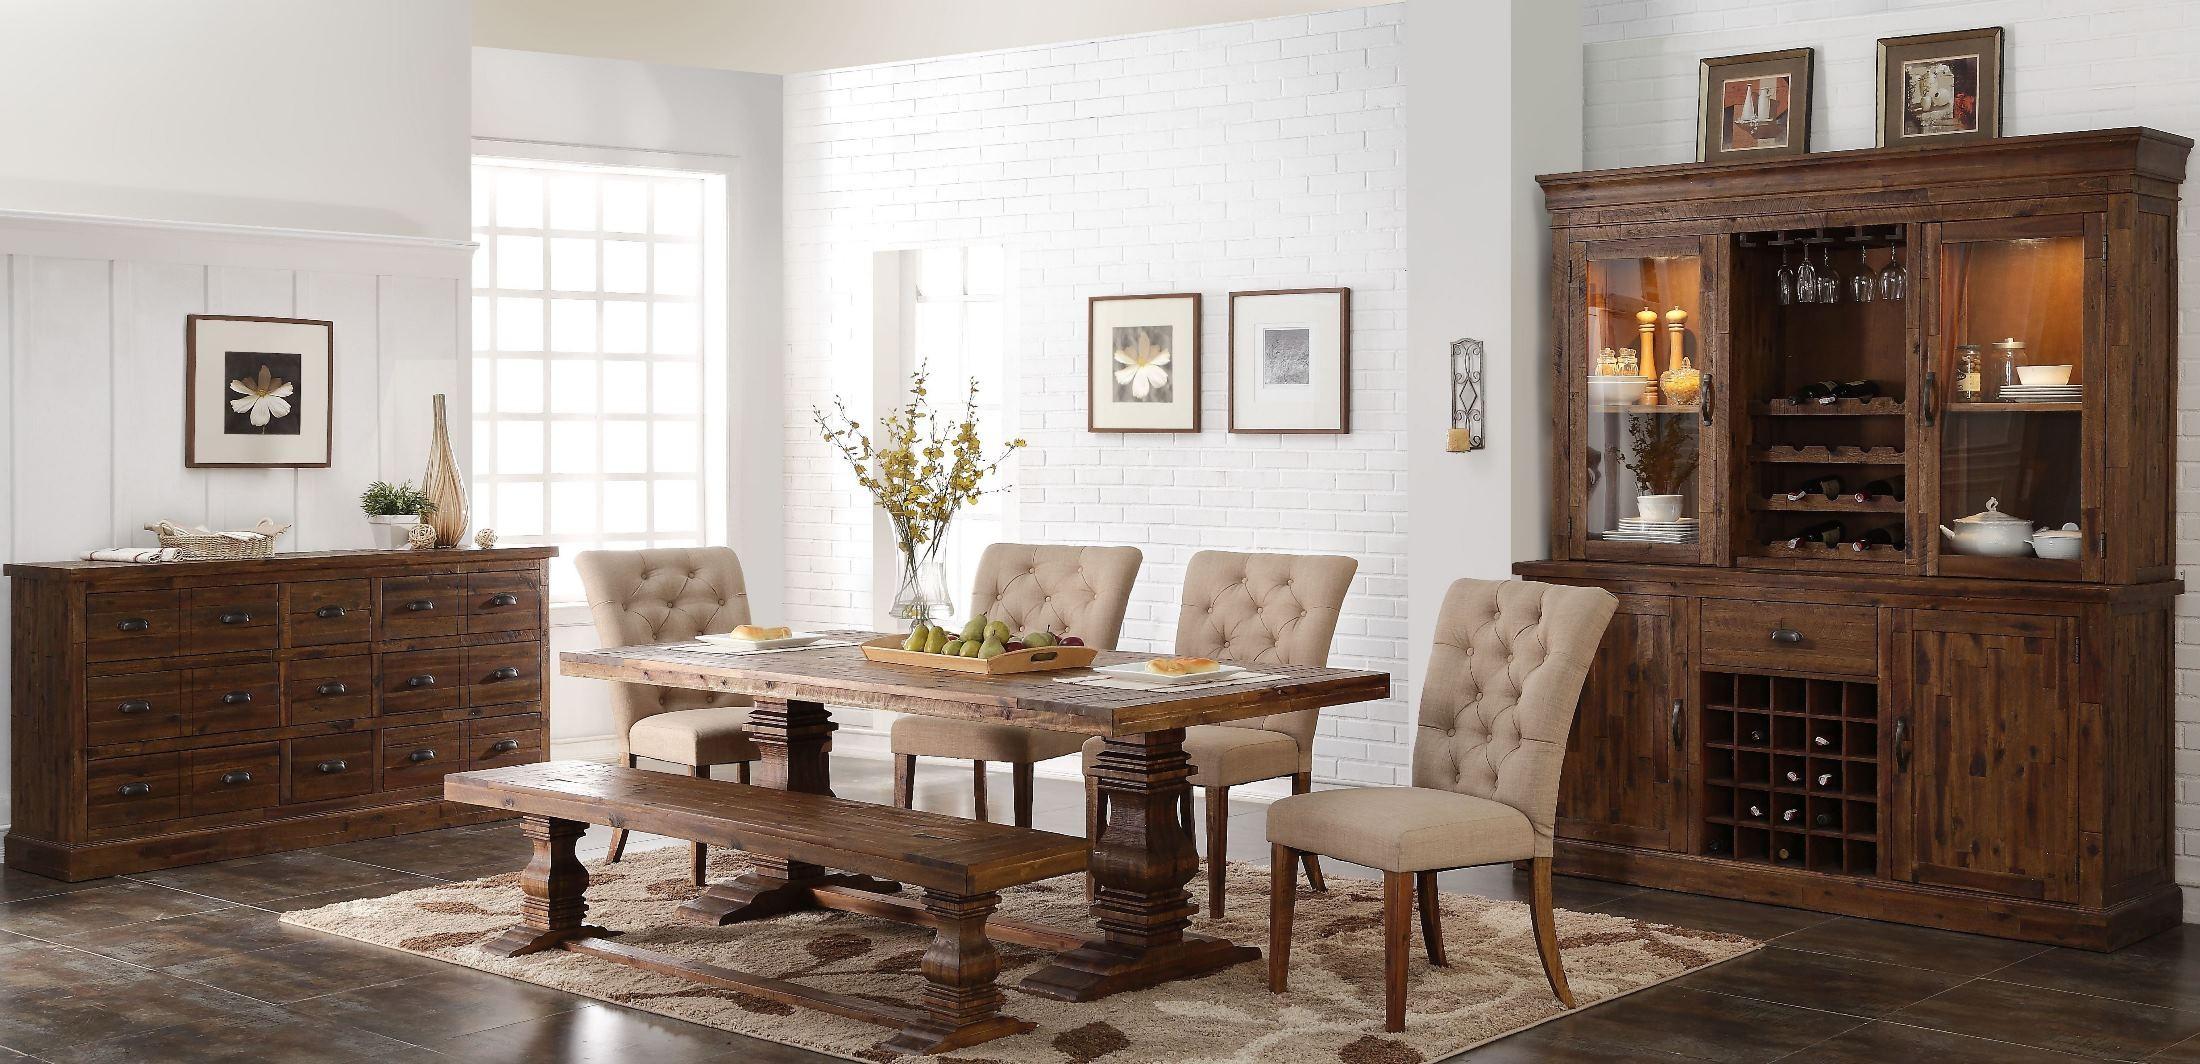 normandy vintage distressed dining room set d1232 10 10b